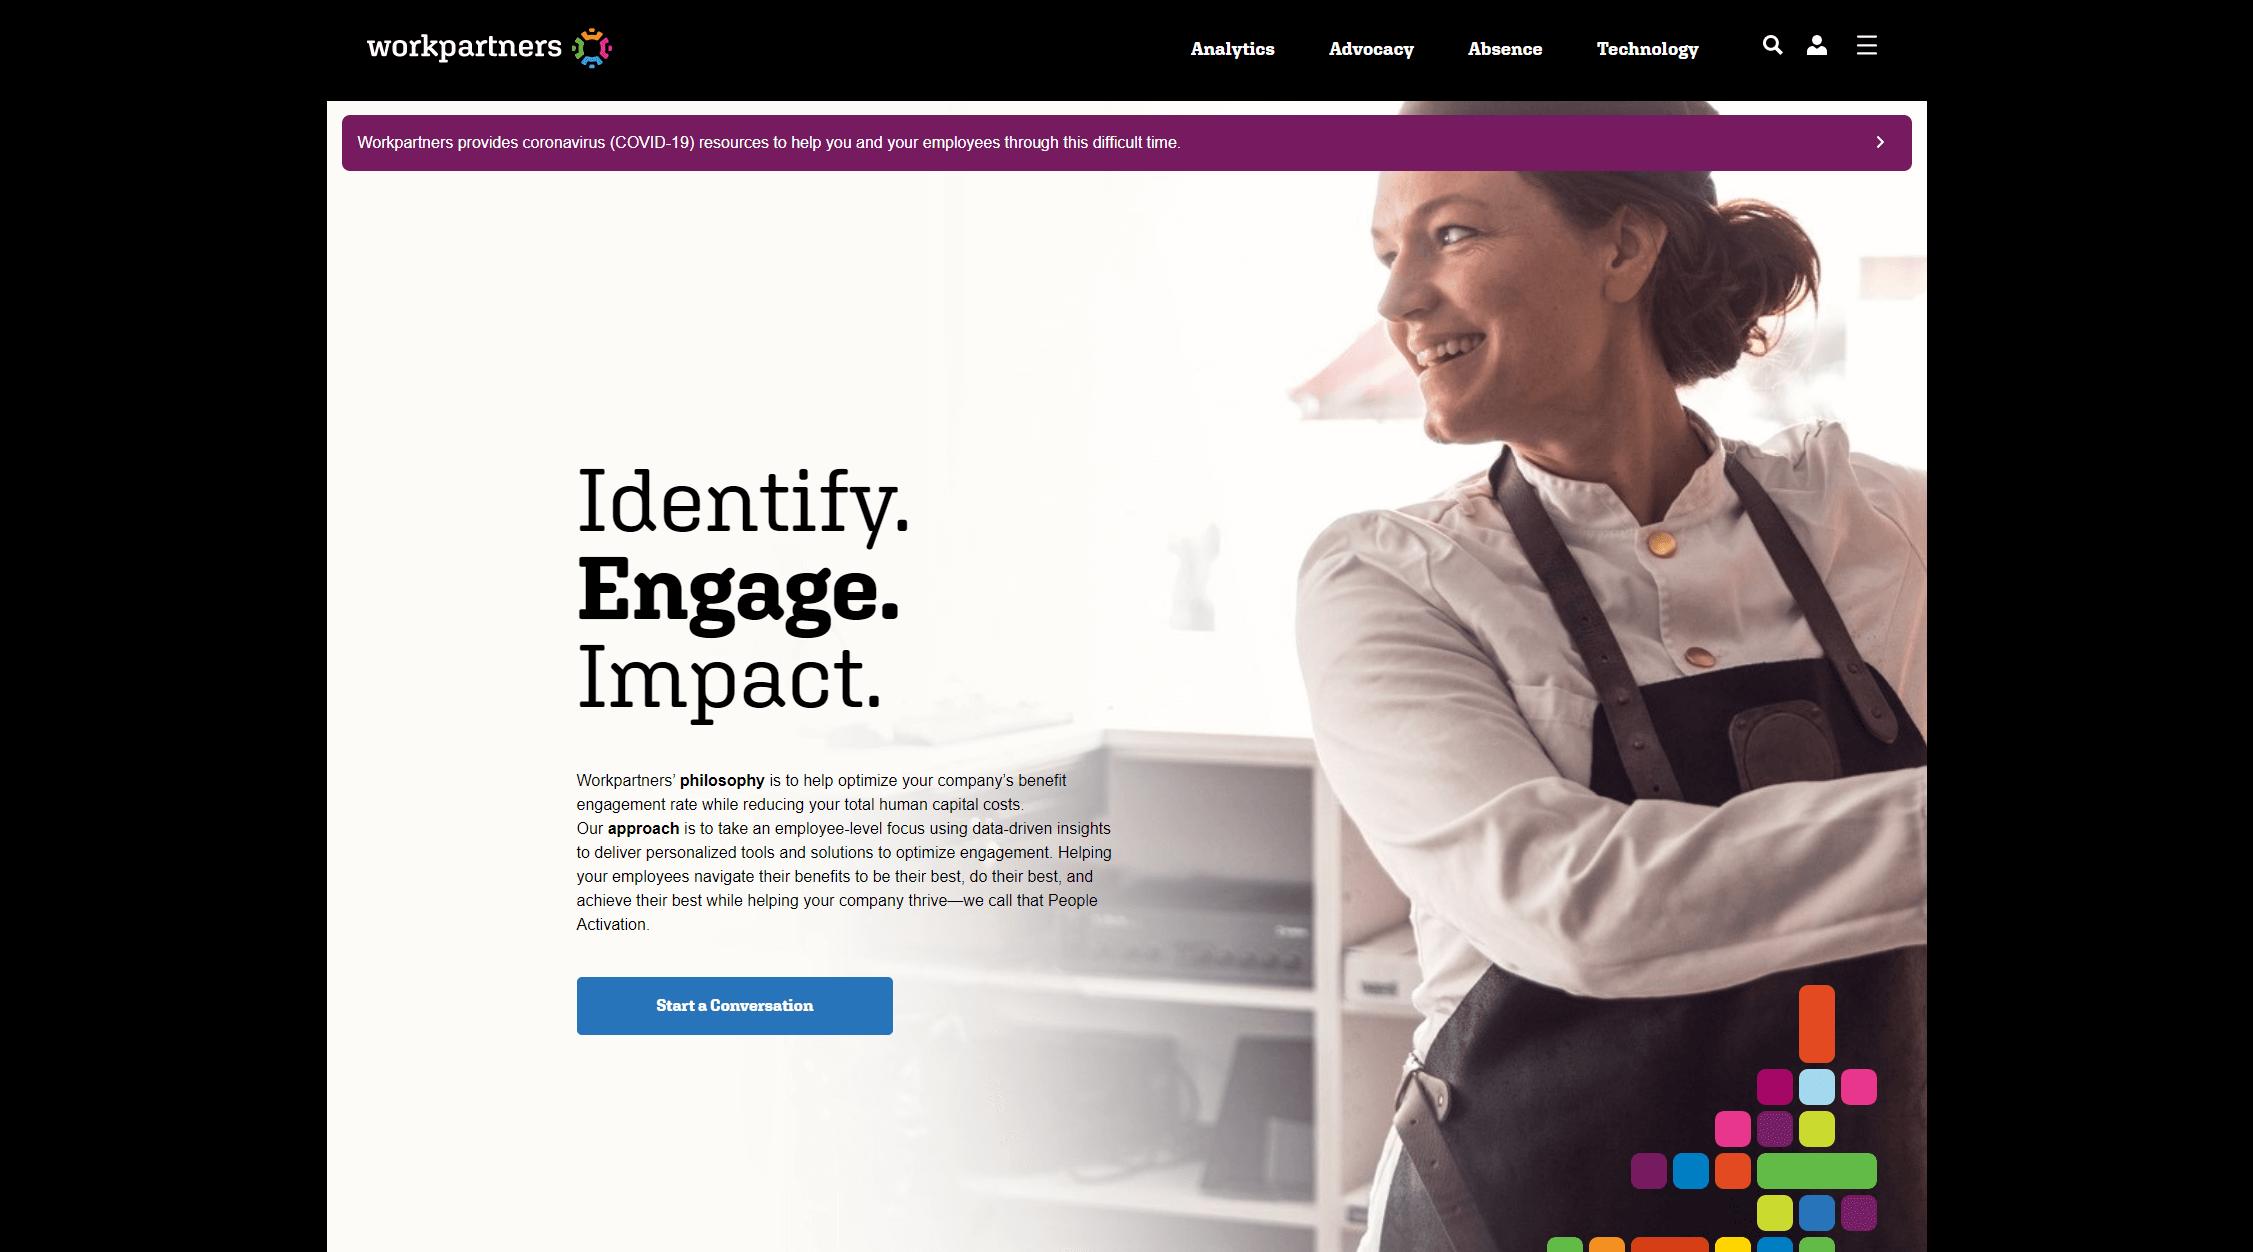 www.workpartners.com